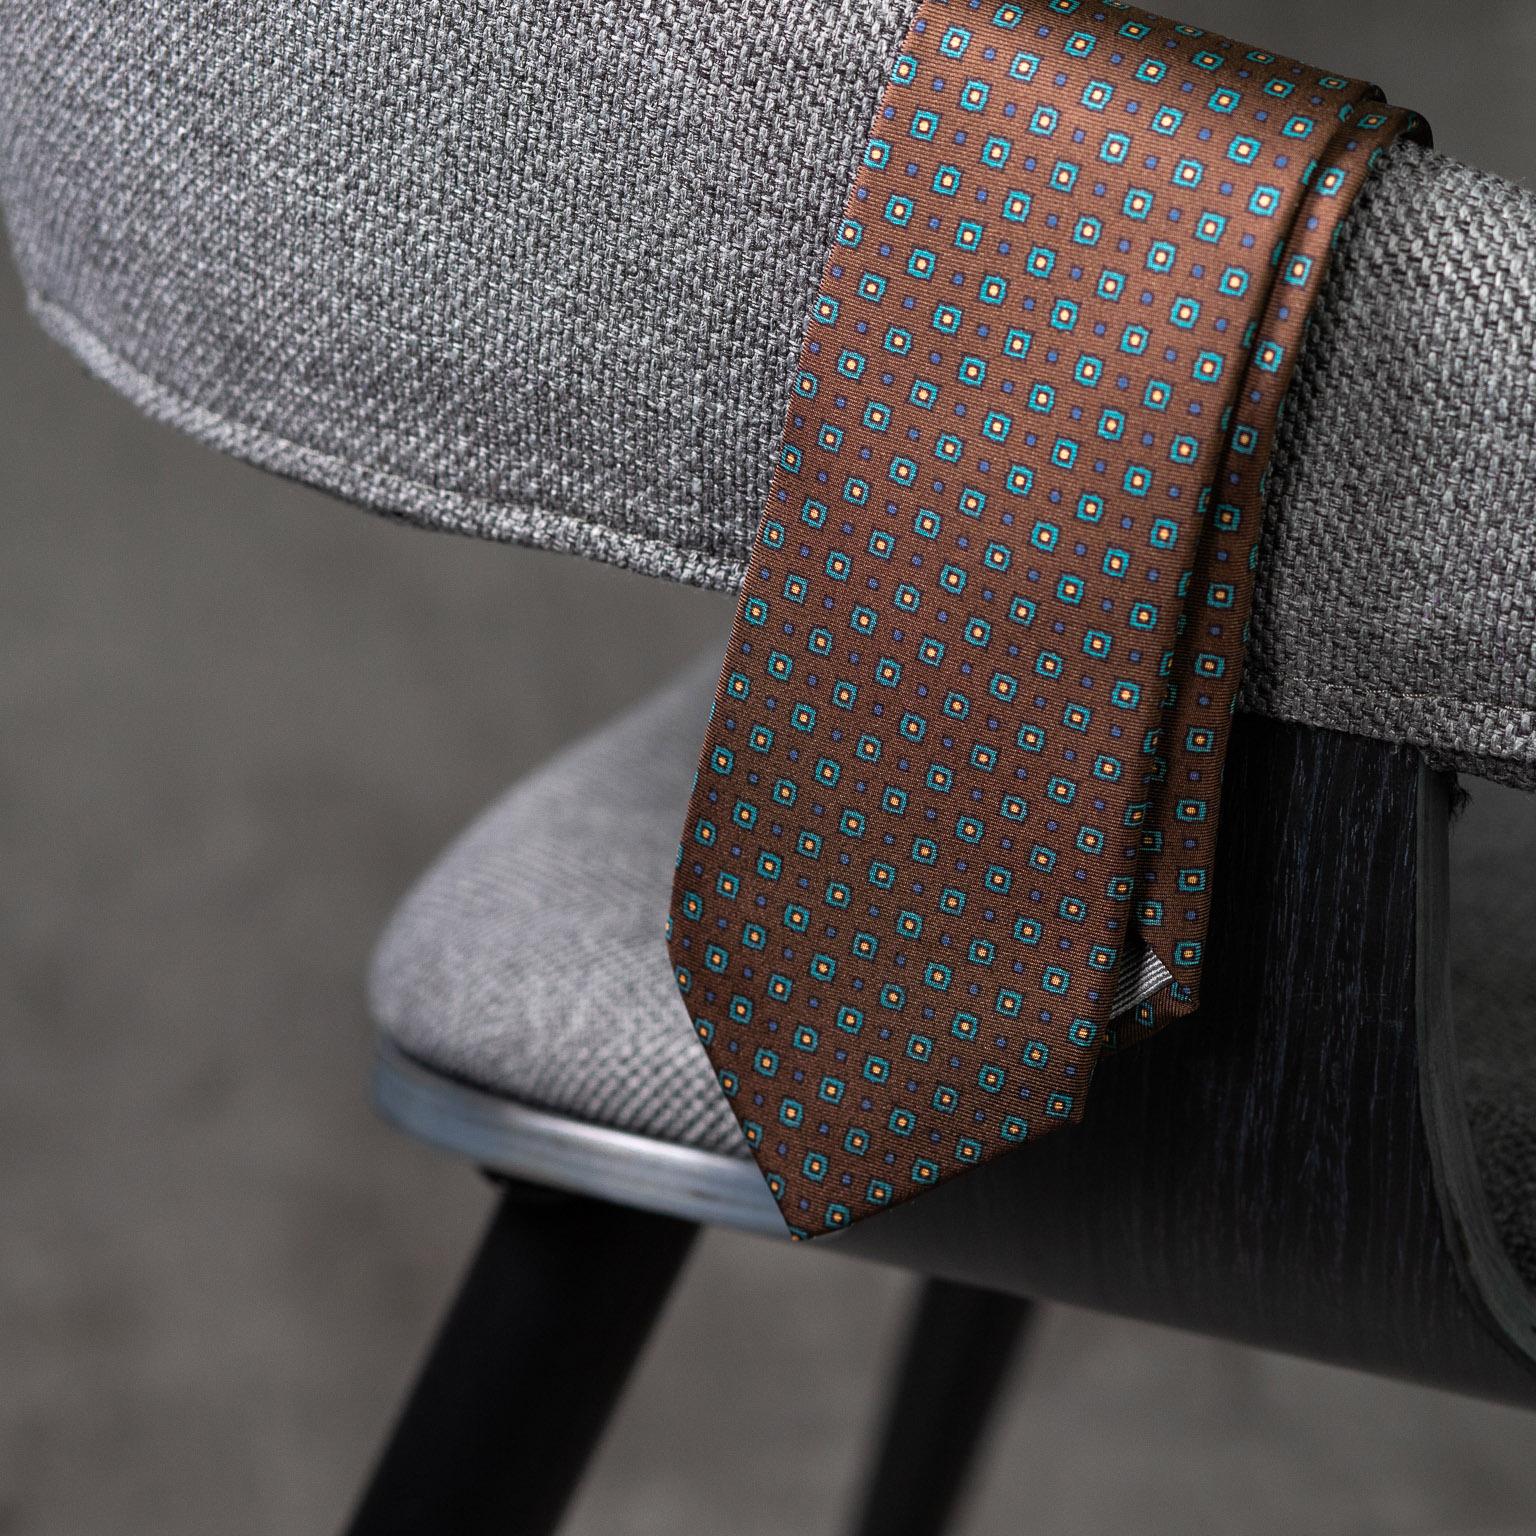 PRINTED-SILK-SEDA-ESTAMPADA-0588-Tie-Initials-Corbata-Iniciales-The-Seelk-3